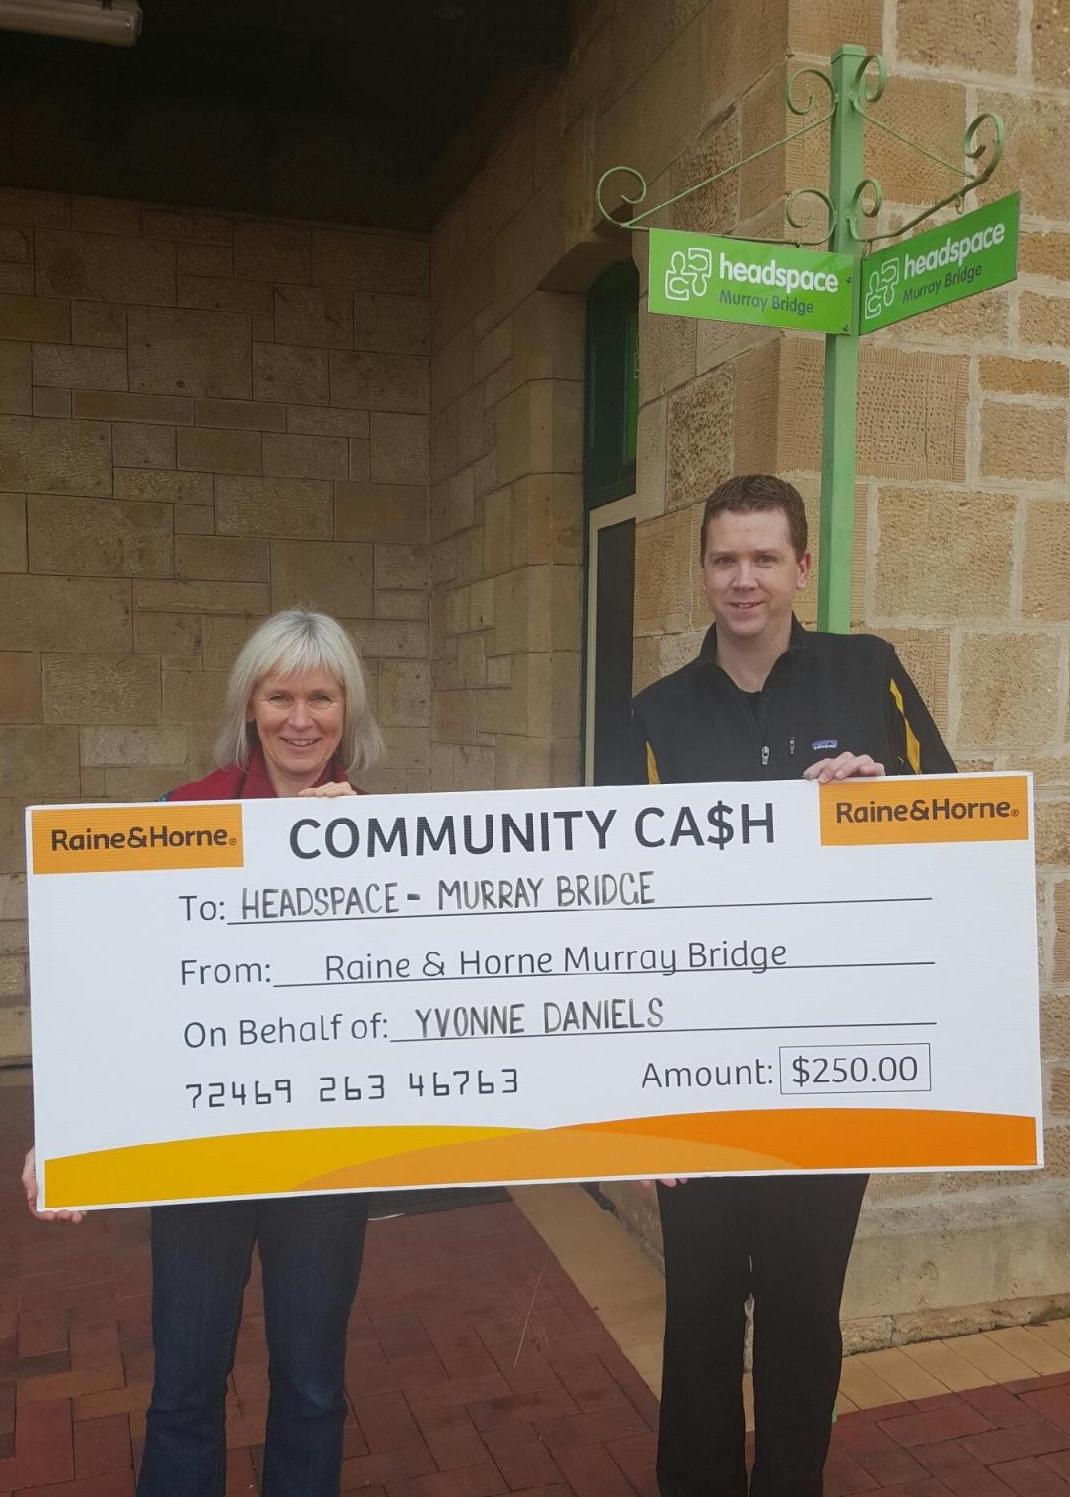 Community Cash - Headspace